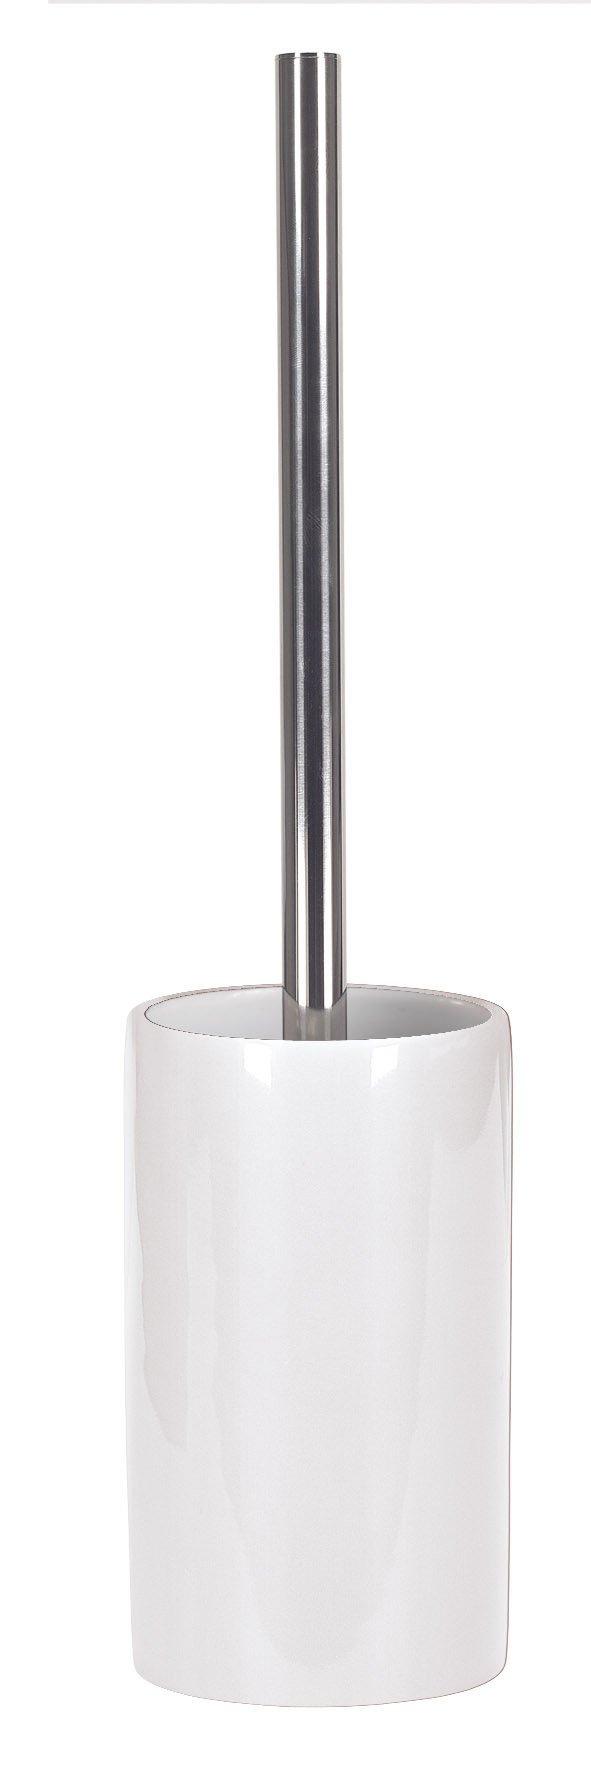 WC-Bürstenhalter Pur Shiny Schneeweiss B:8,5cm